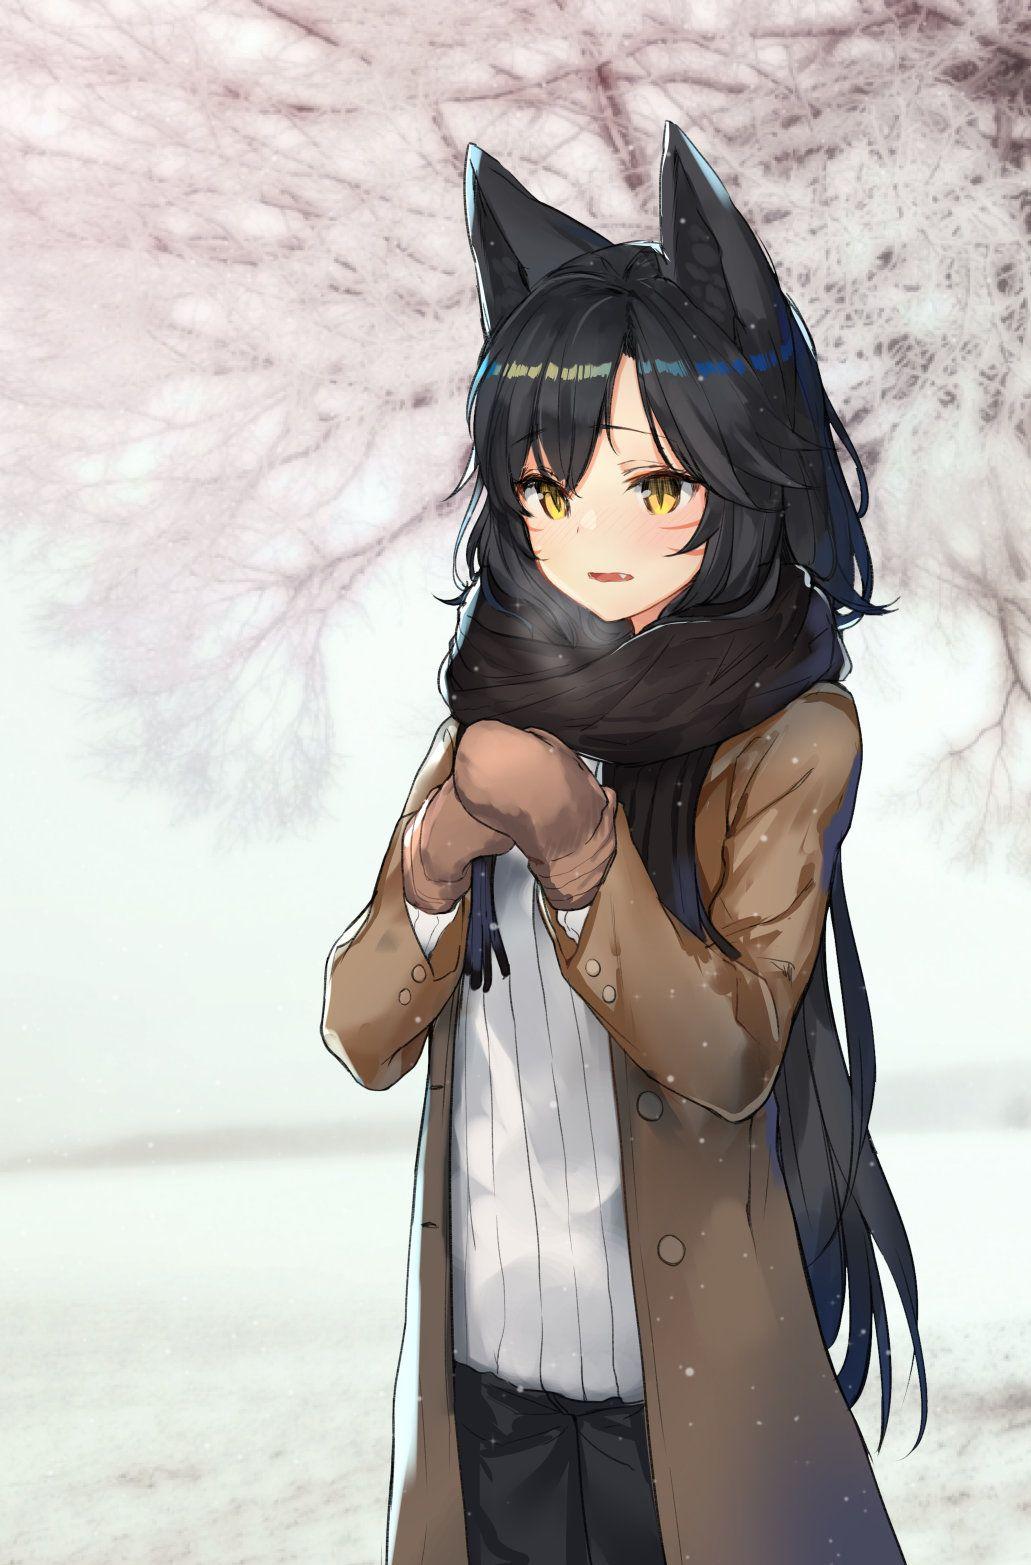 Pin by aj padayao on anime pinterest anime neko and manga